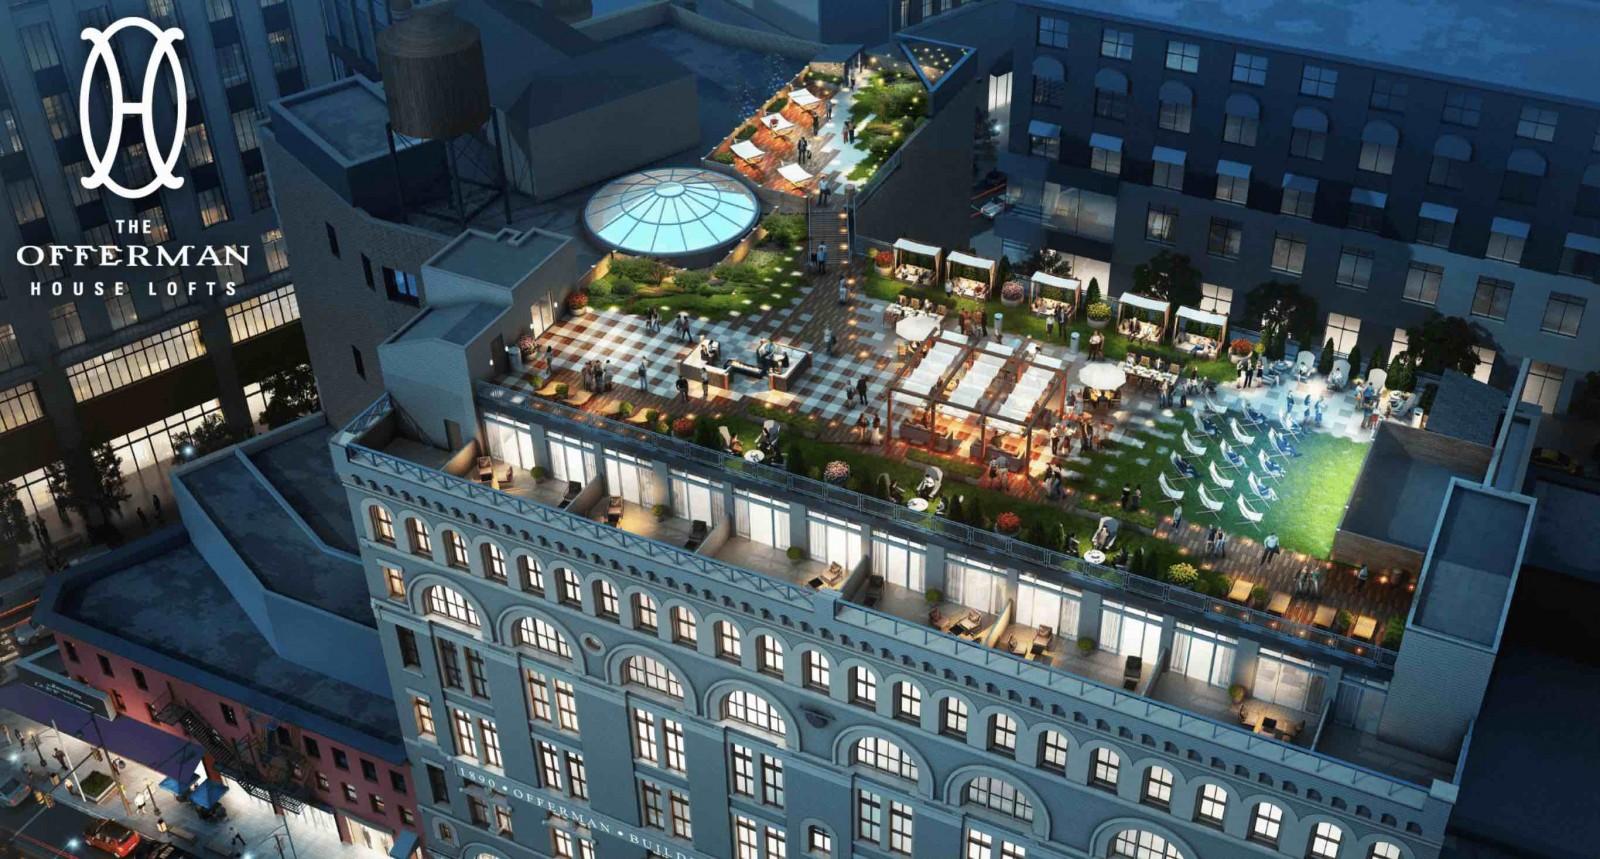 rooftop-decks-nyc-roof-terrace-manhattan